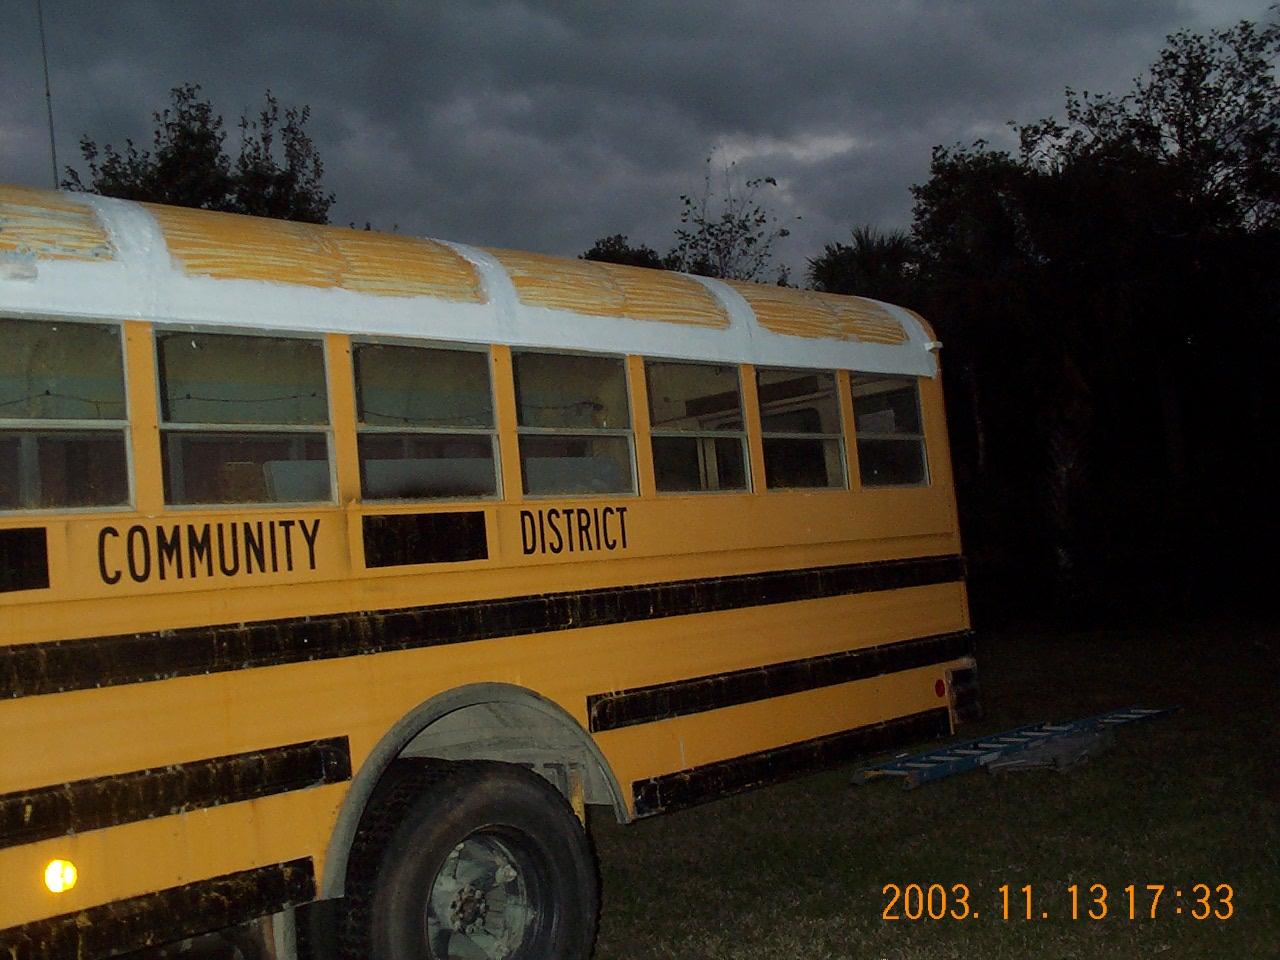 Bus 16Nov03 005